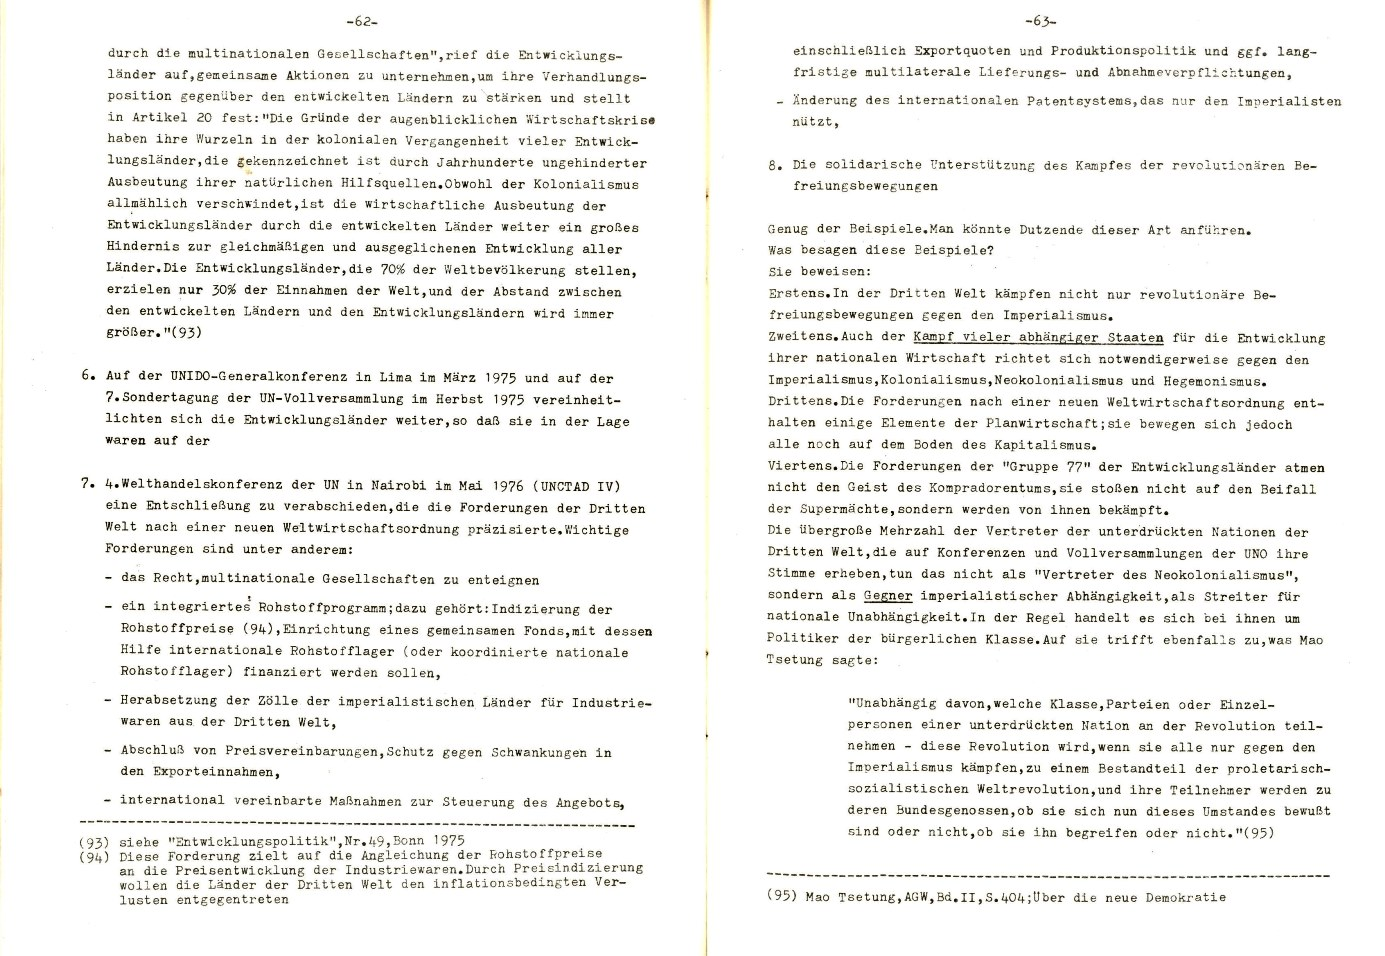 Muenchen_Kampf_dem_Revisionismus_1978_04_05_33